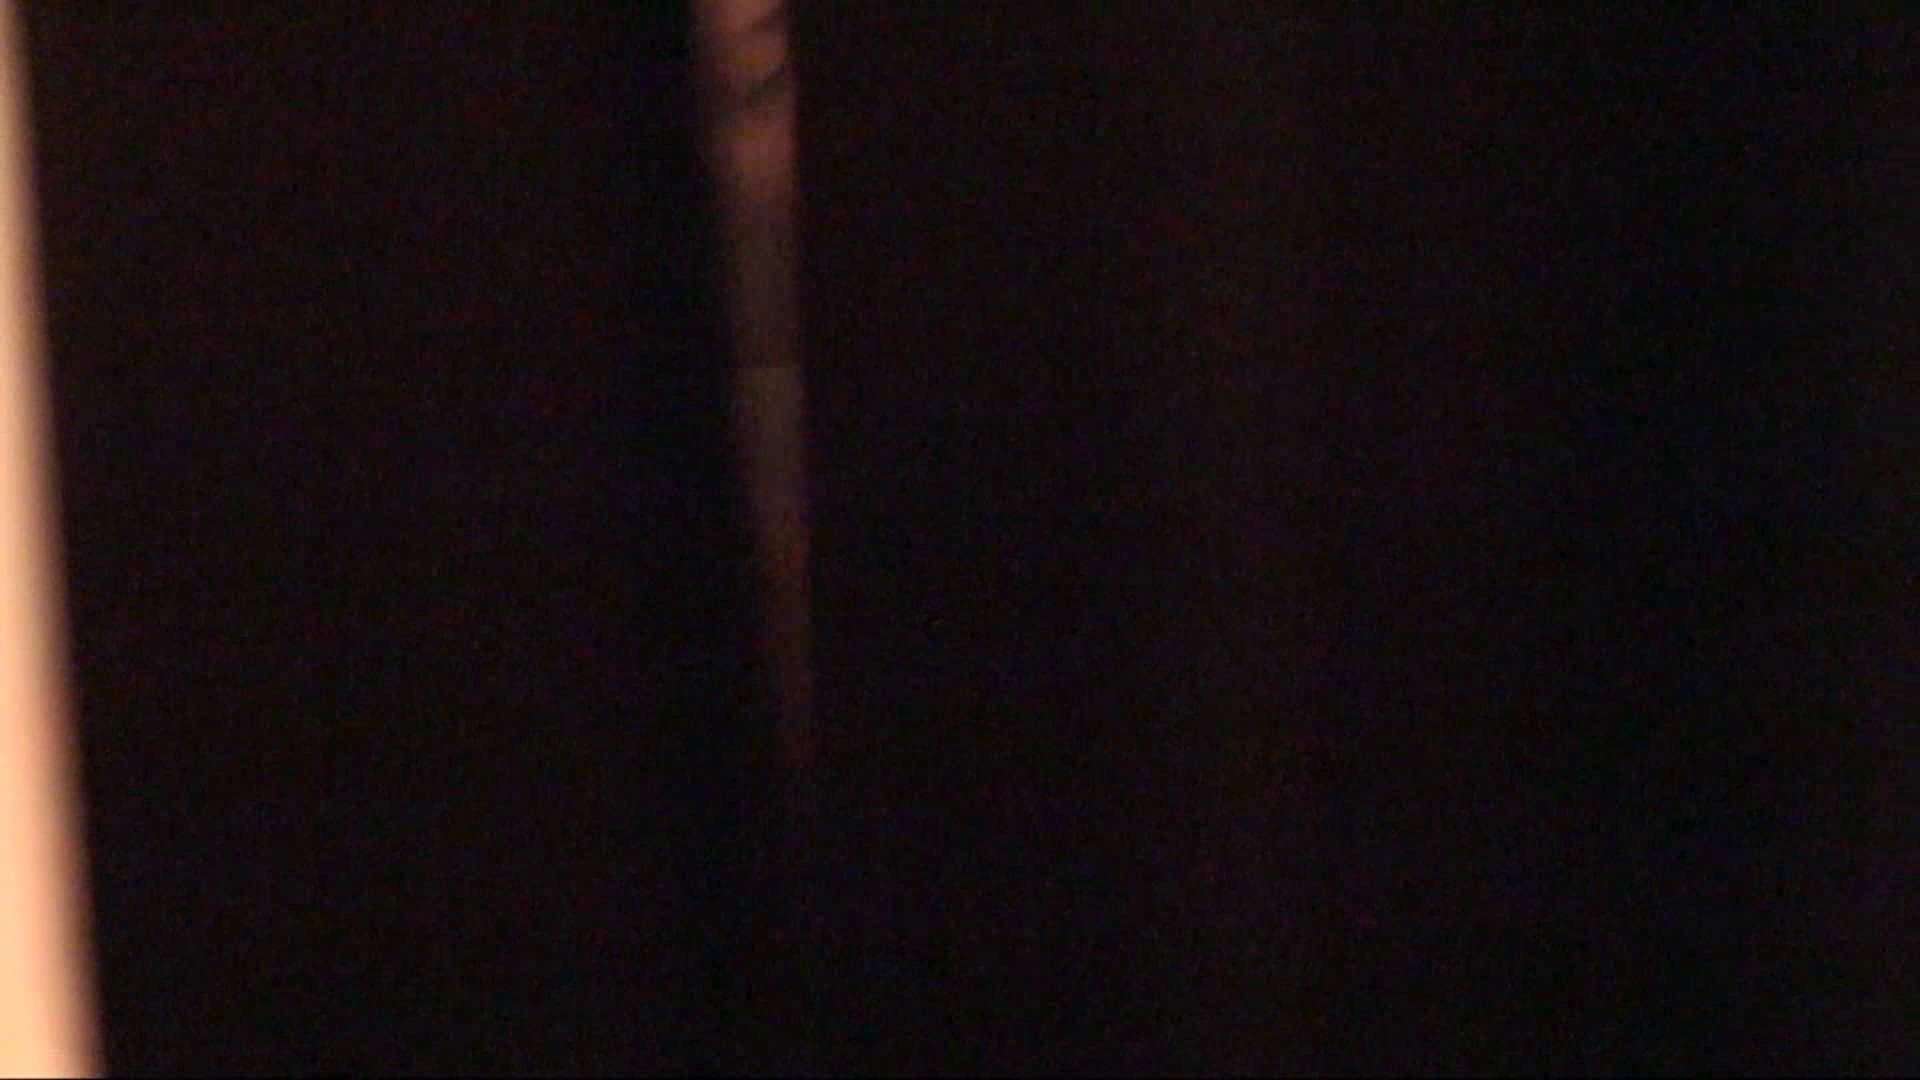 vol.02超可愛すぎる彼女の裸体をハイビジョンで!至近距離での眺め最高! 覗きもの オメコ動画キャプチャ 75枚 6